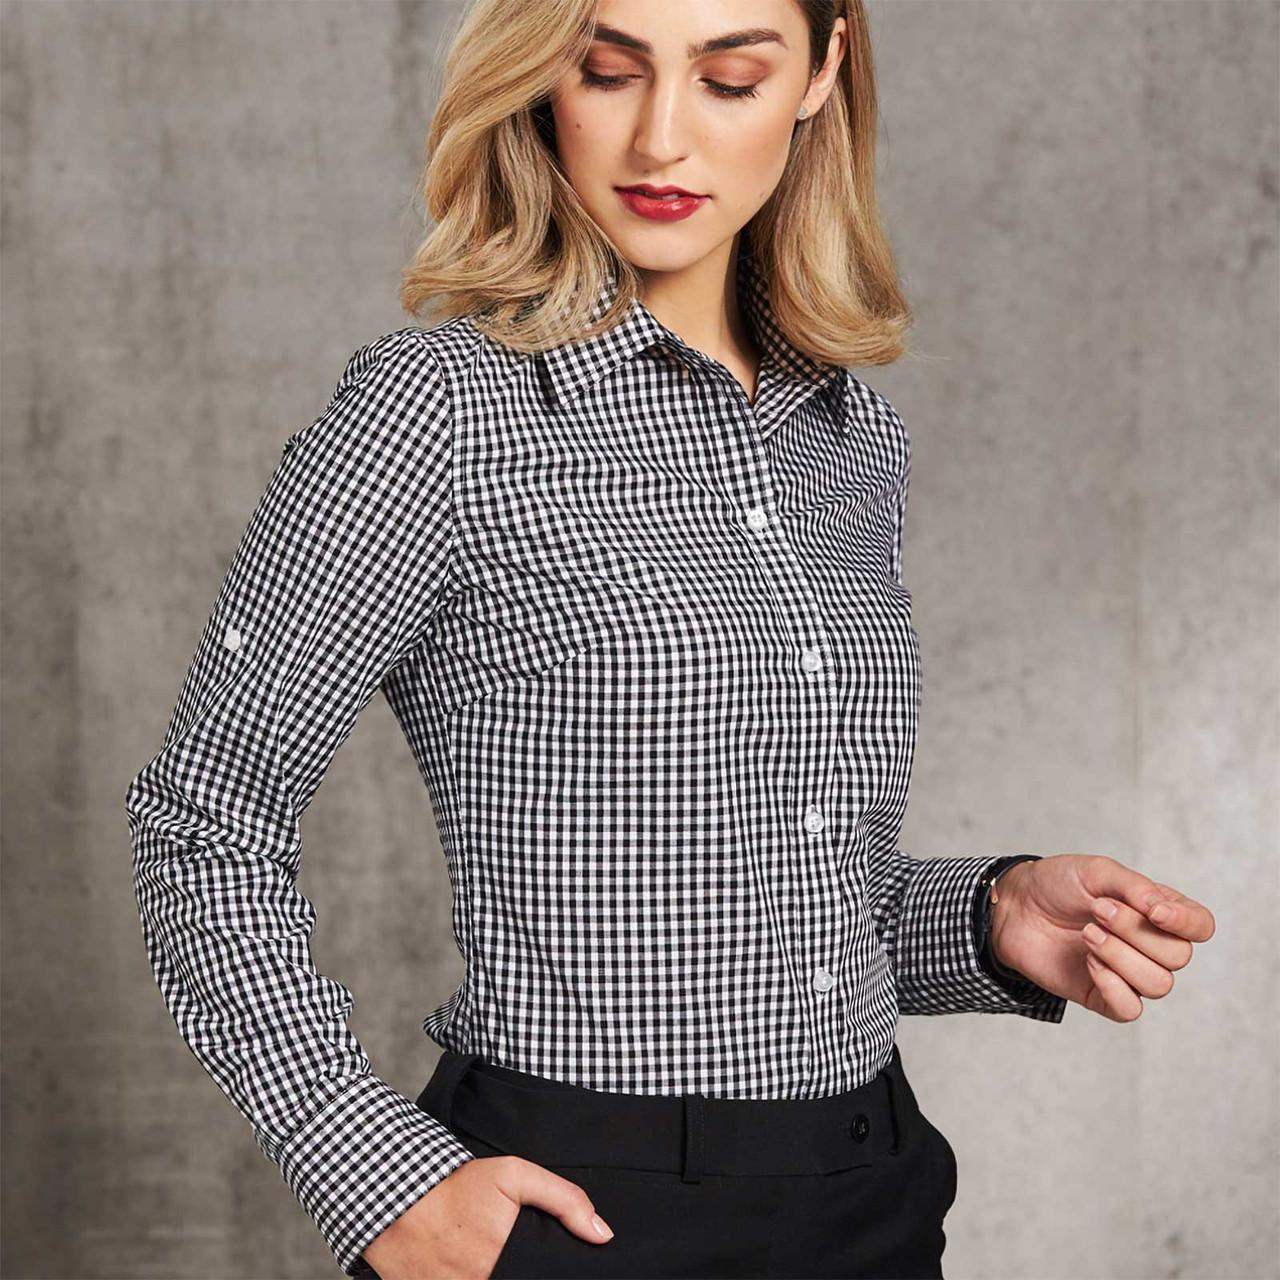 Ladies Gingham Checkered Short Sleeve Shirt Shop Business Shirts Online